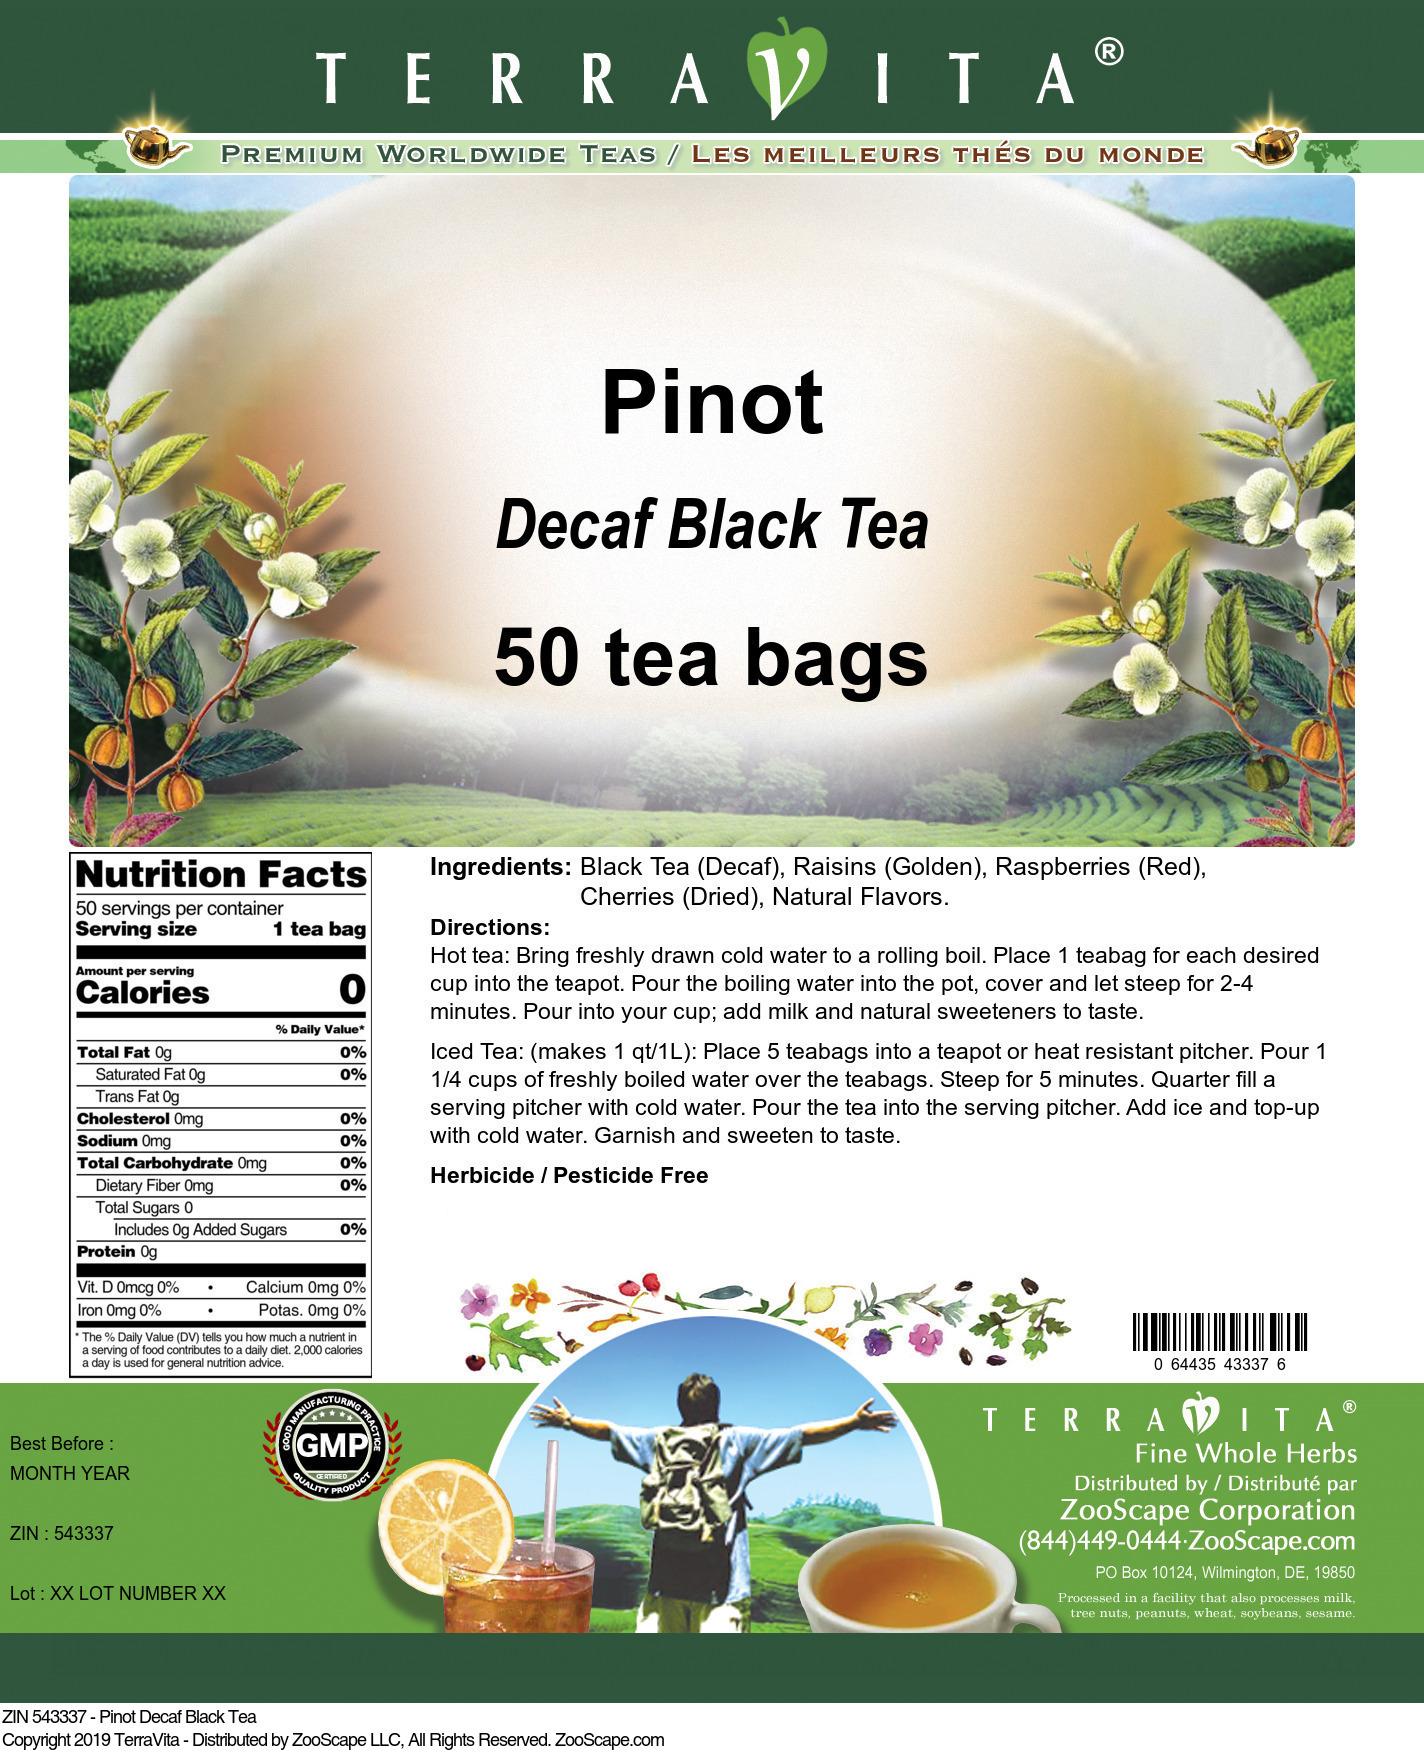 Pinot Decaf Black Tea